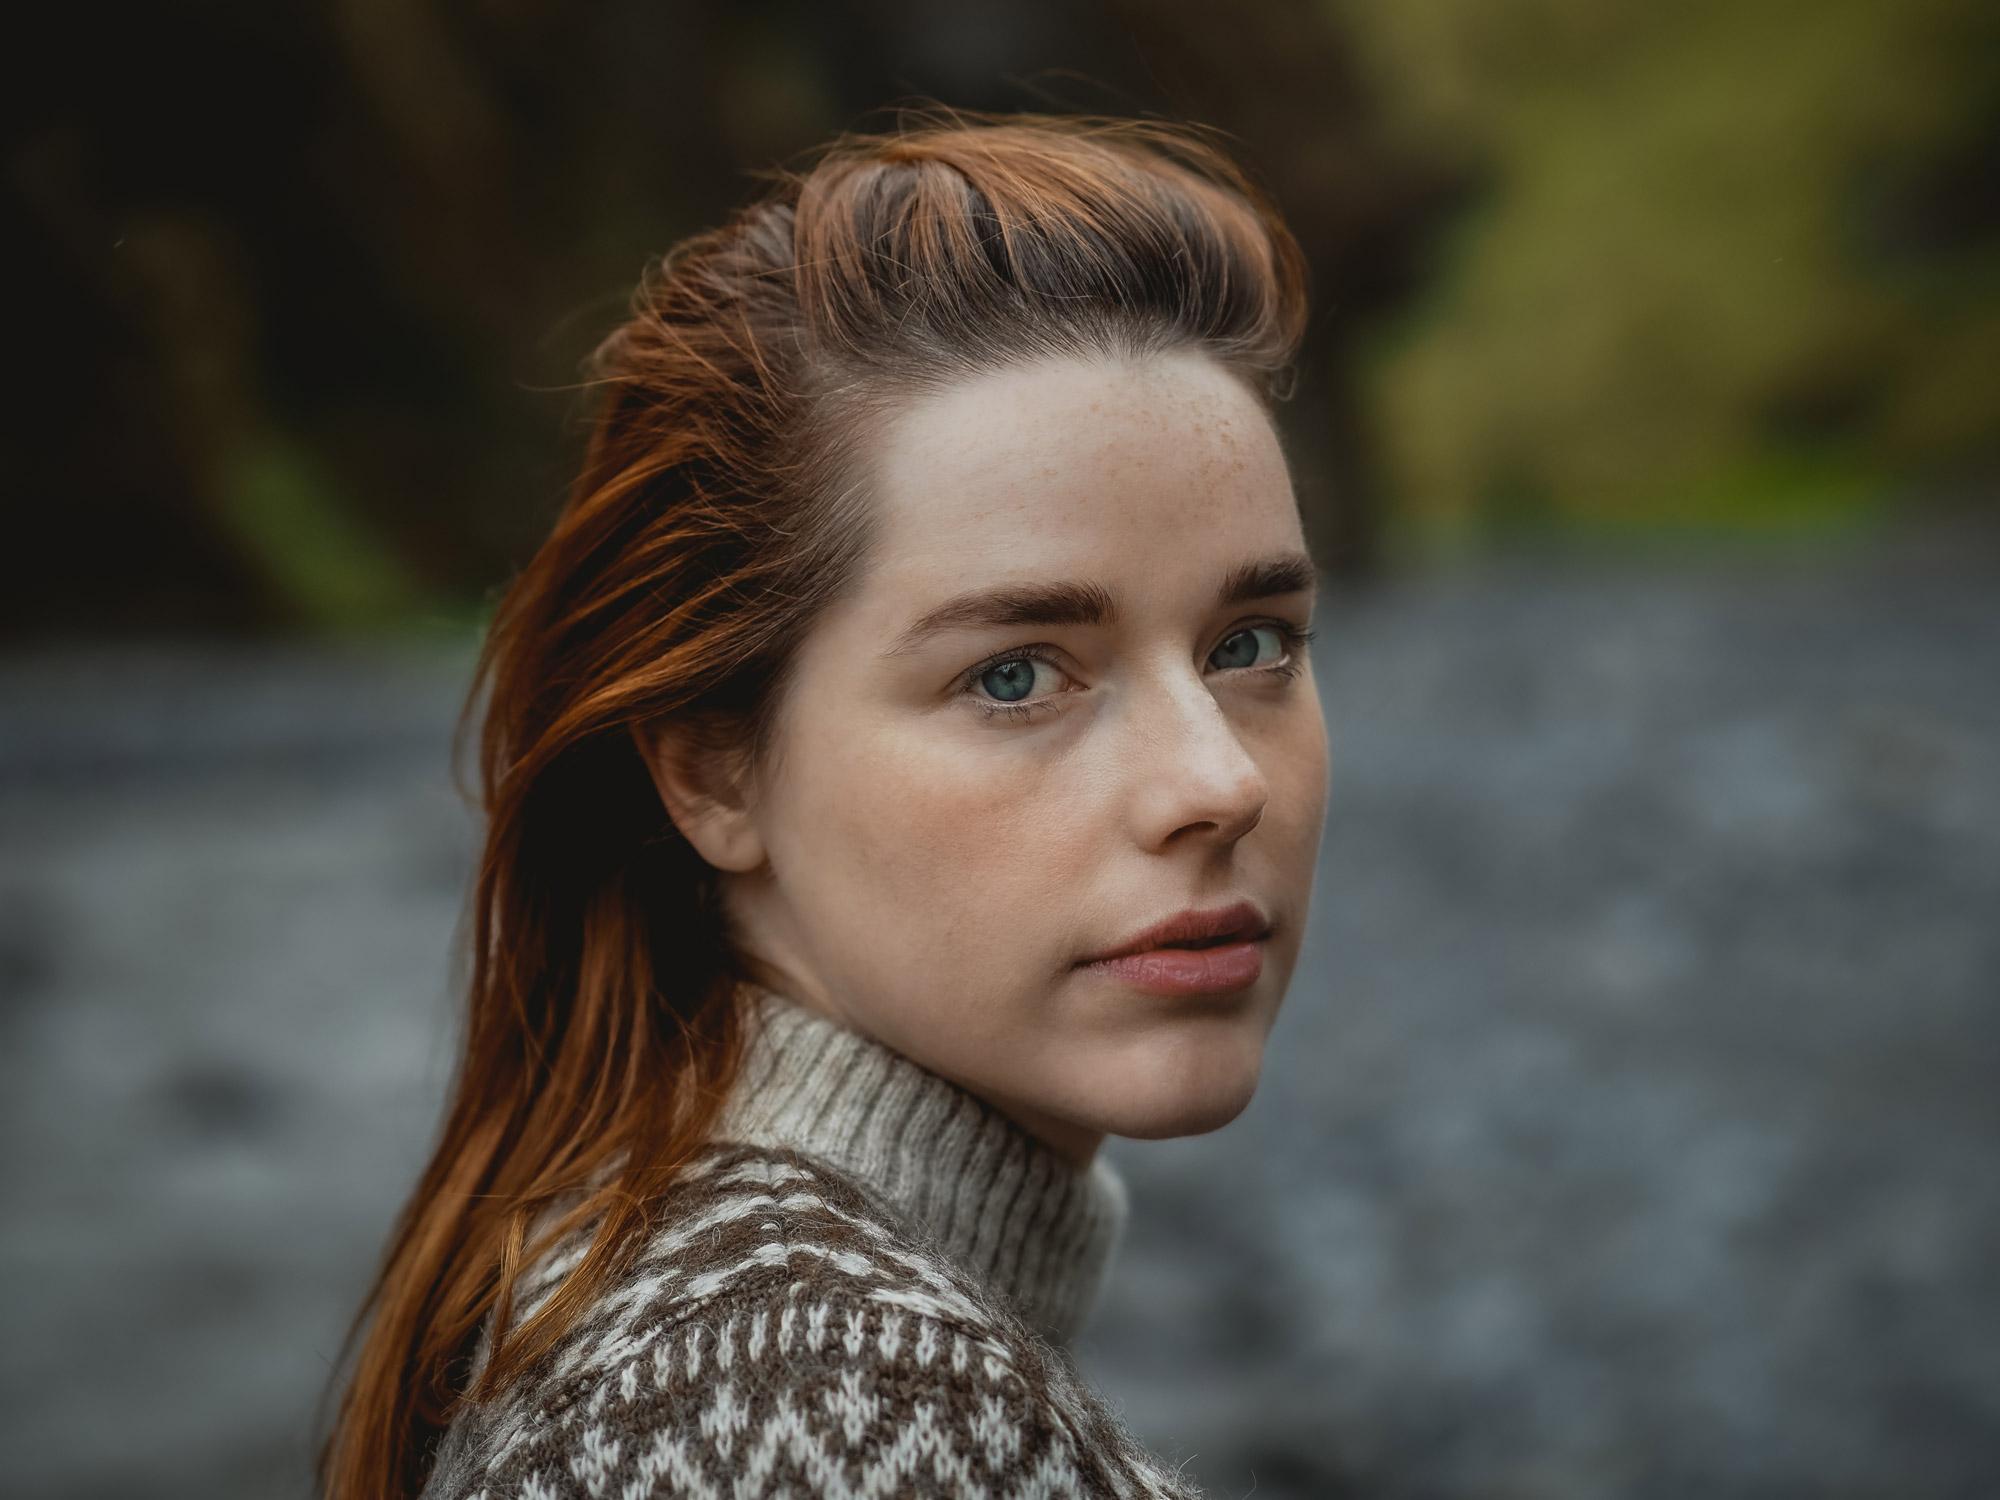 Frau Portrait Outdoor